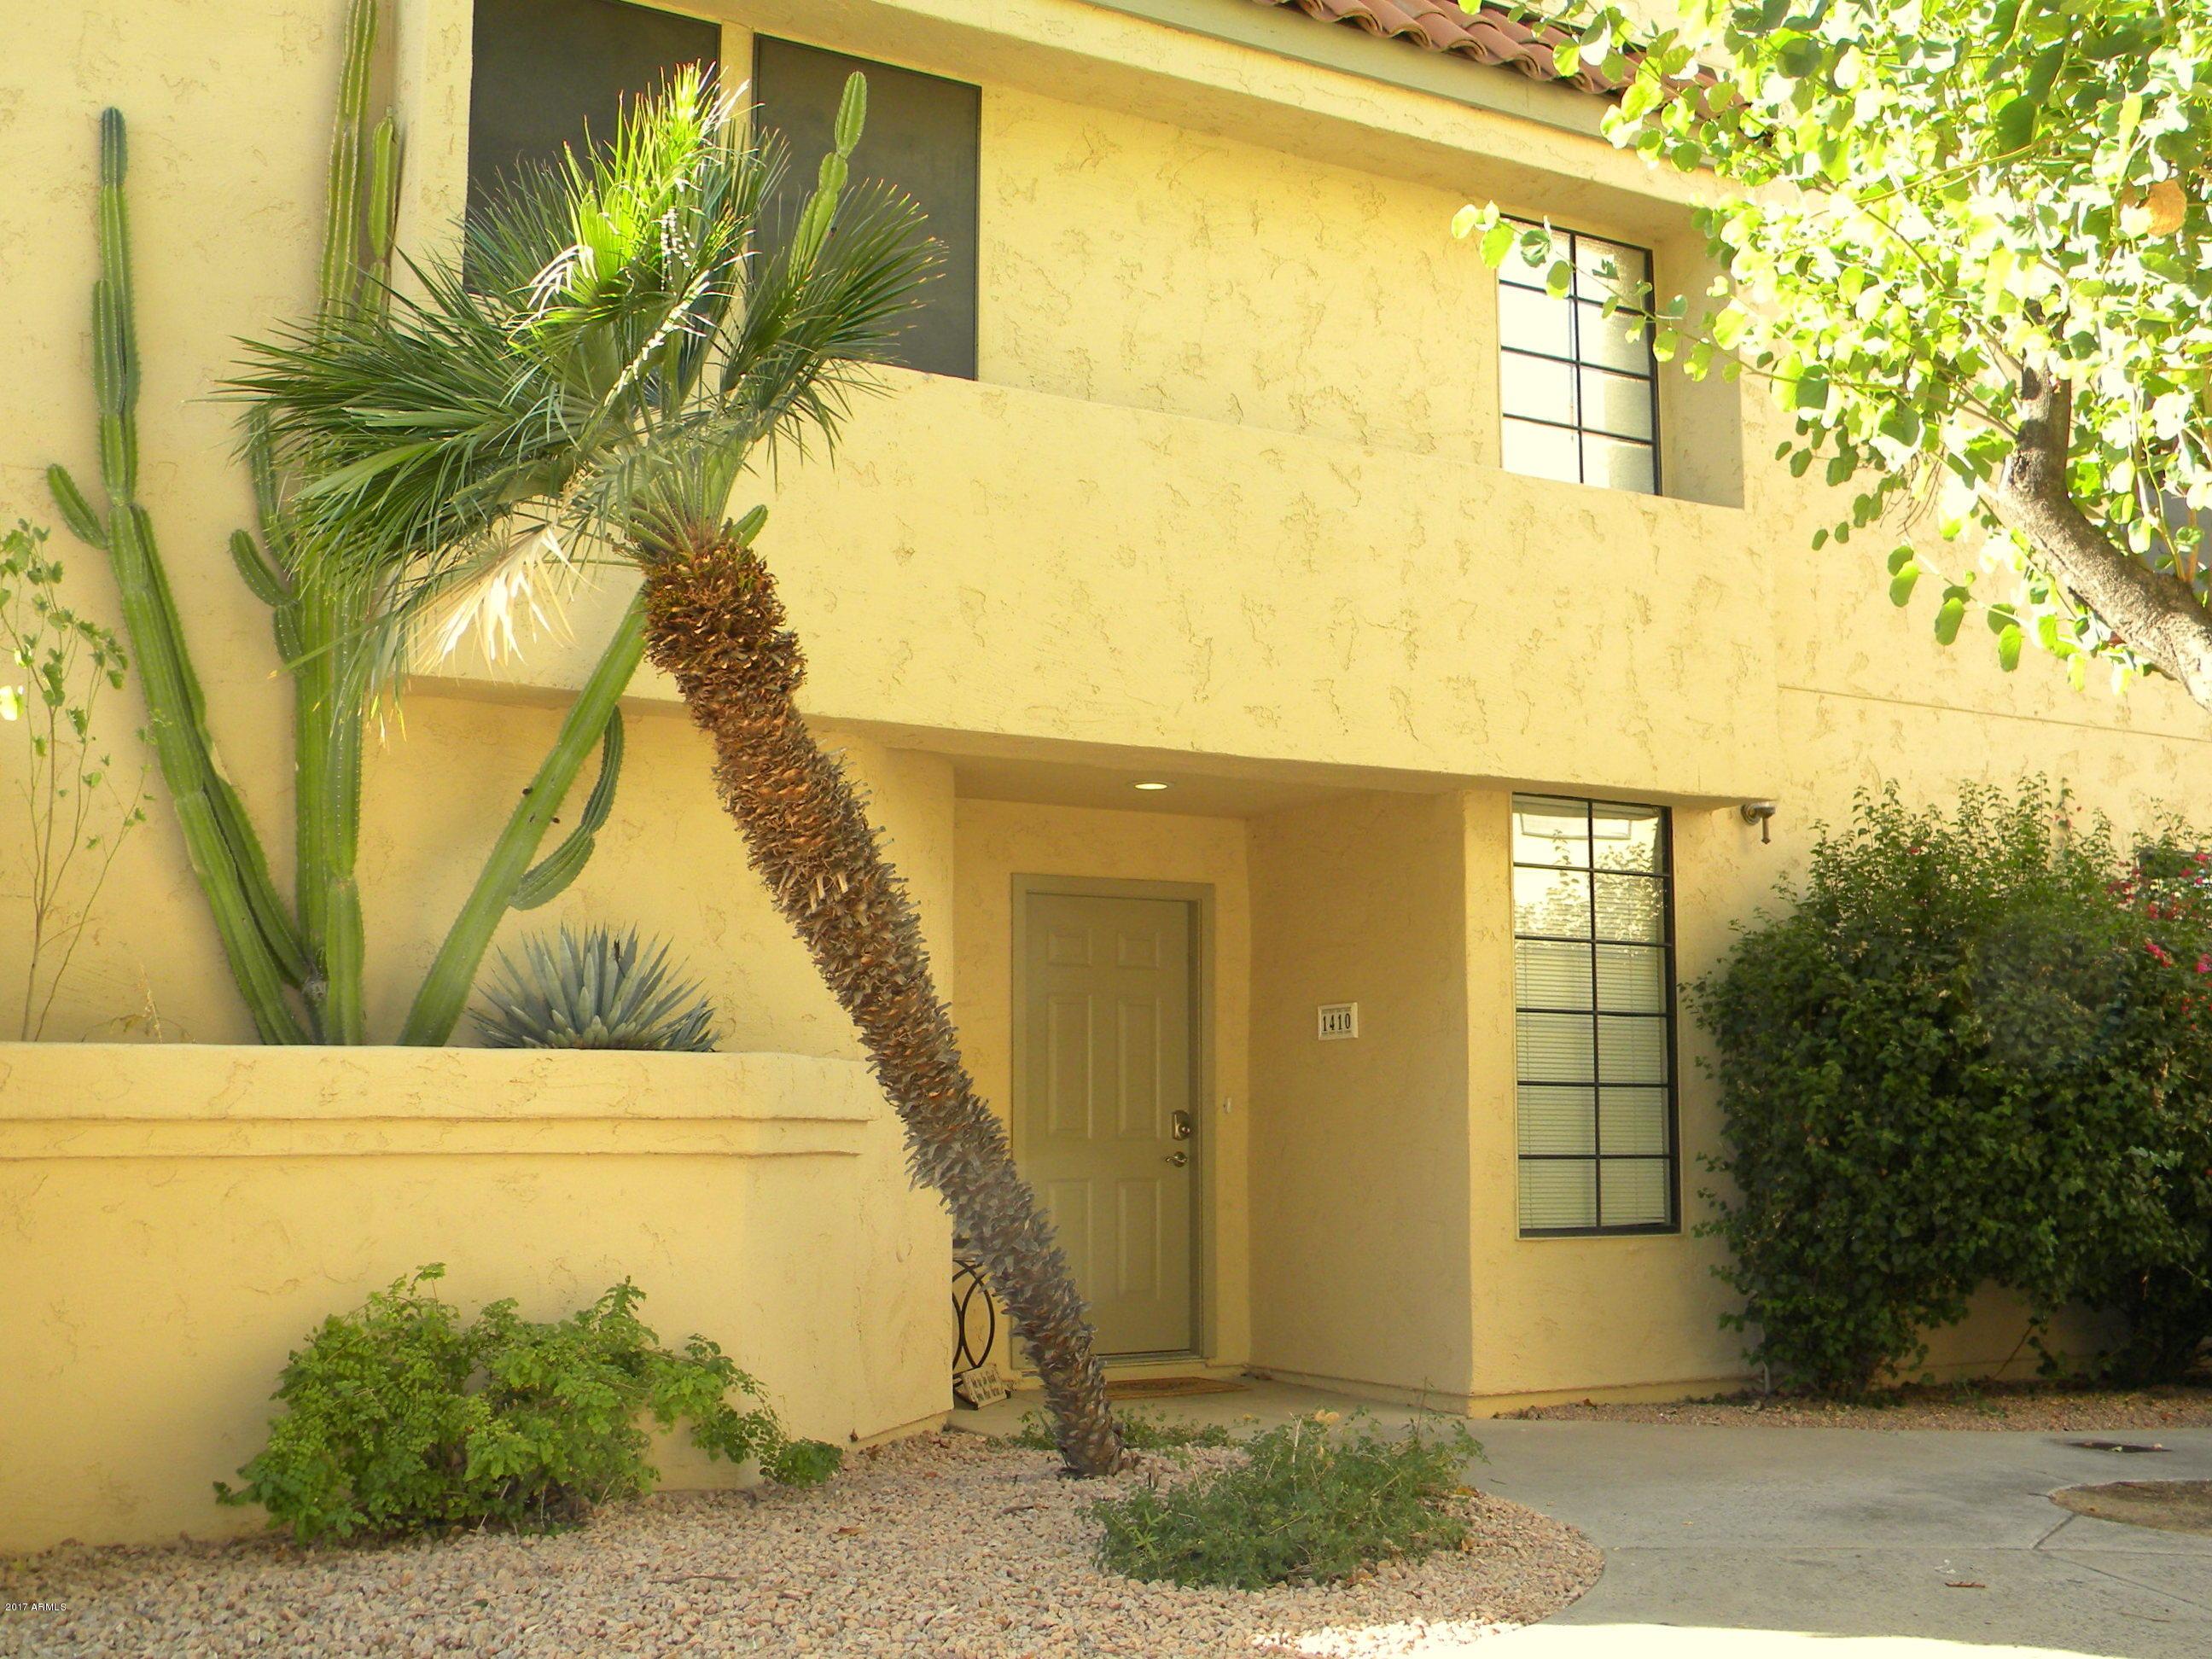 9707 E Mountain View Road, Unit 1410, Scottsdale AZ 85258 - Photo 1